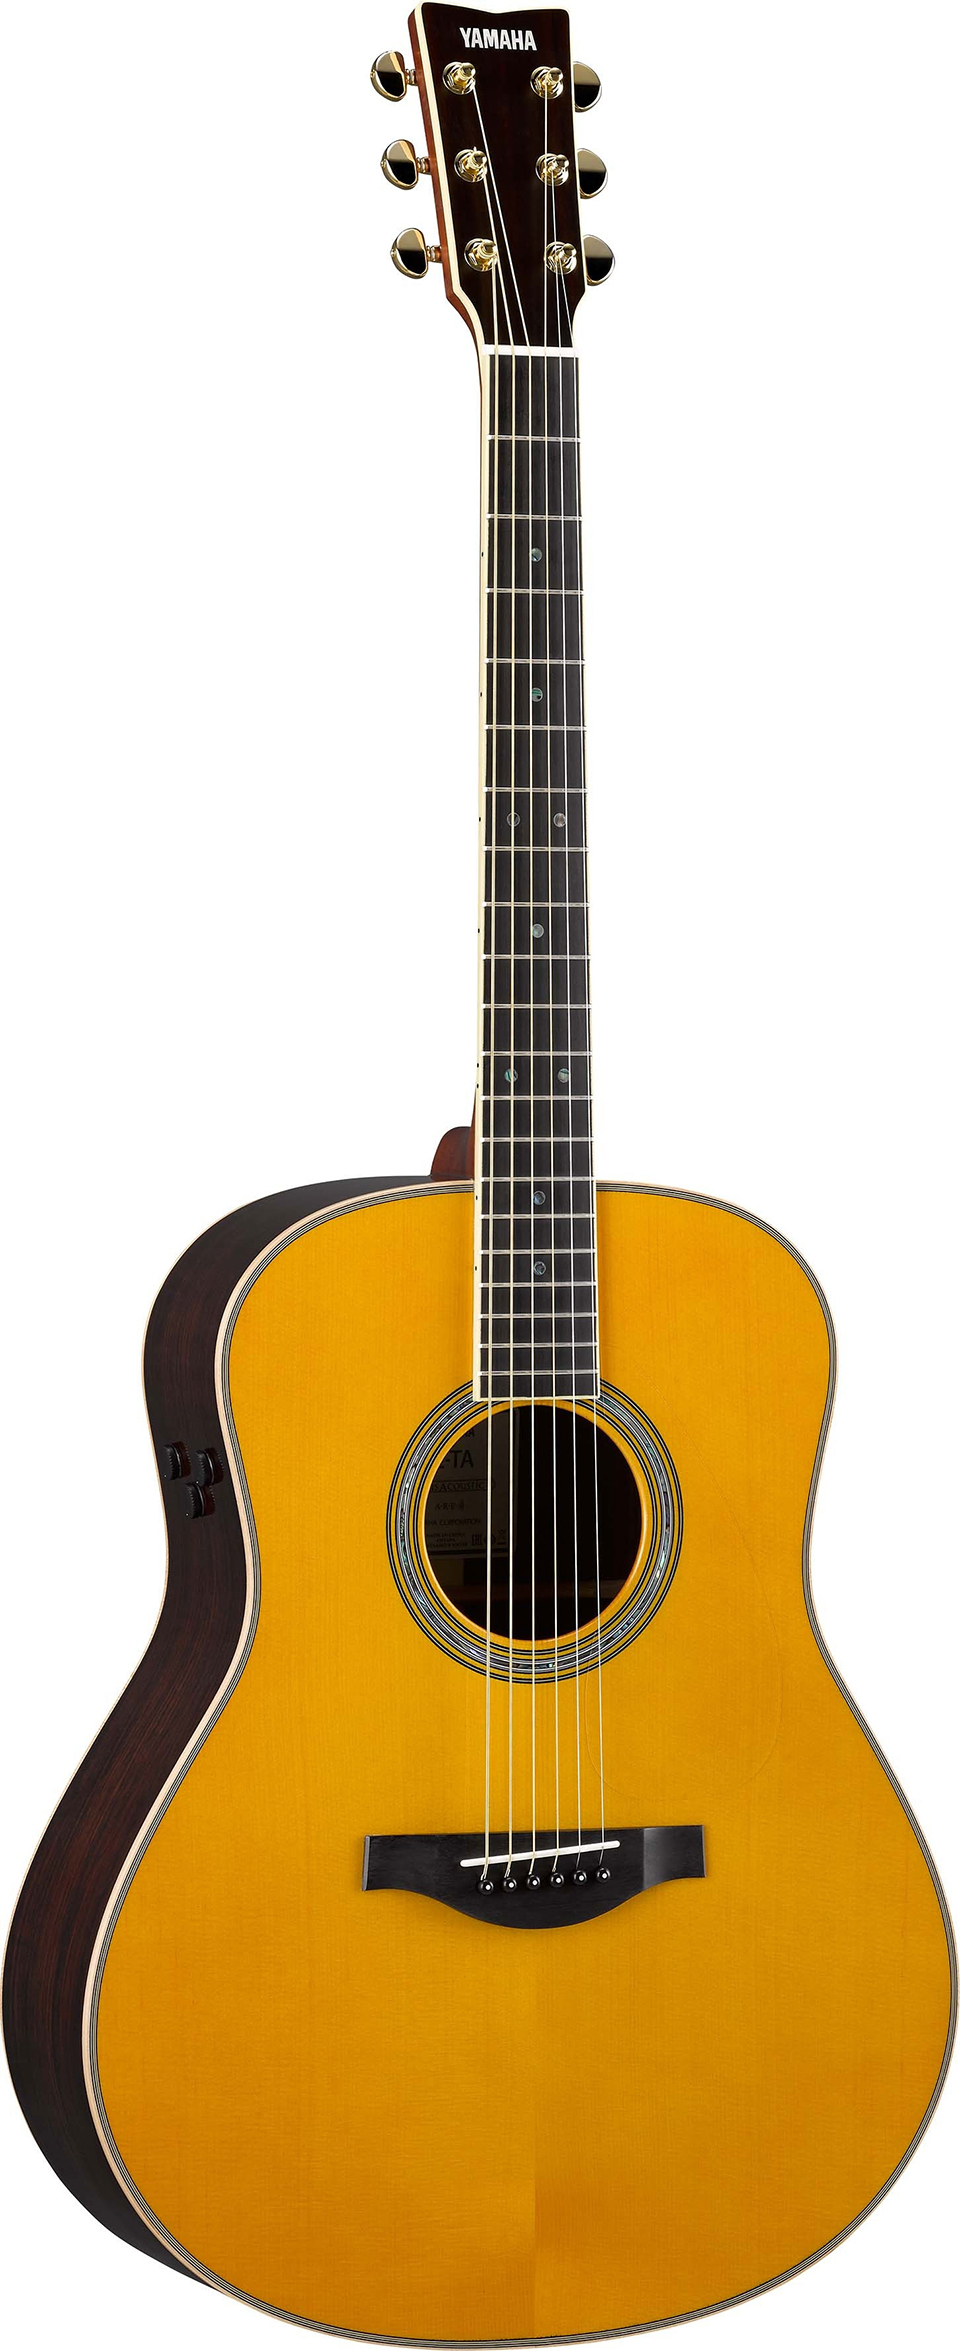 Yamaha TransAcoustic Guitars